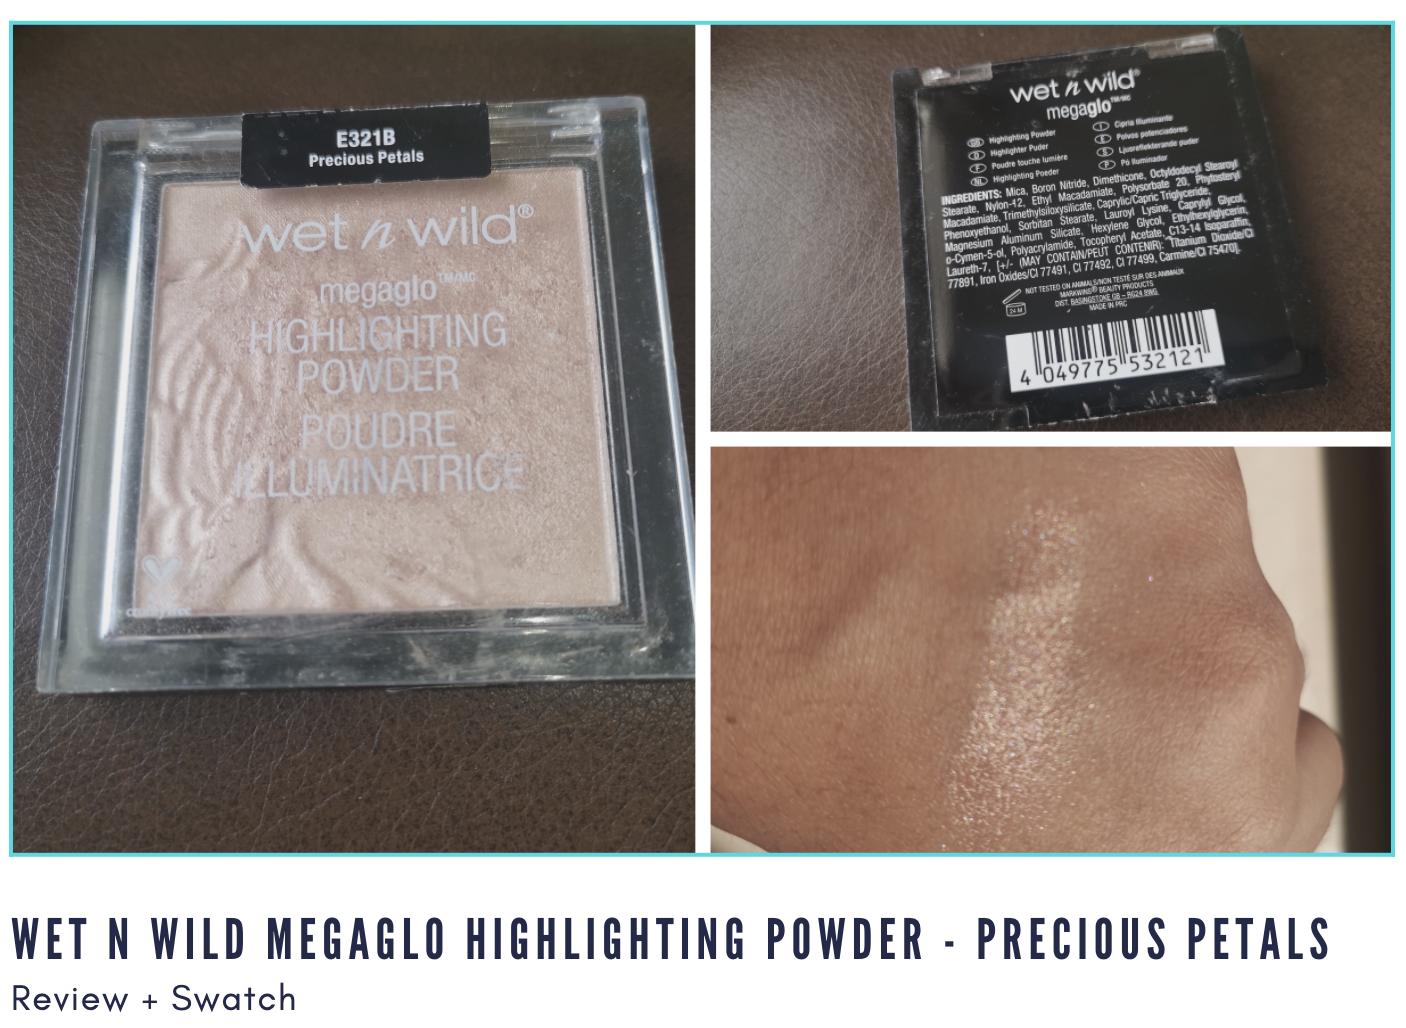 Wet n Wild Megaglo Highlighting Powder Review - Precious Petals - Display Image